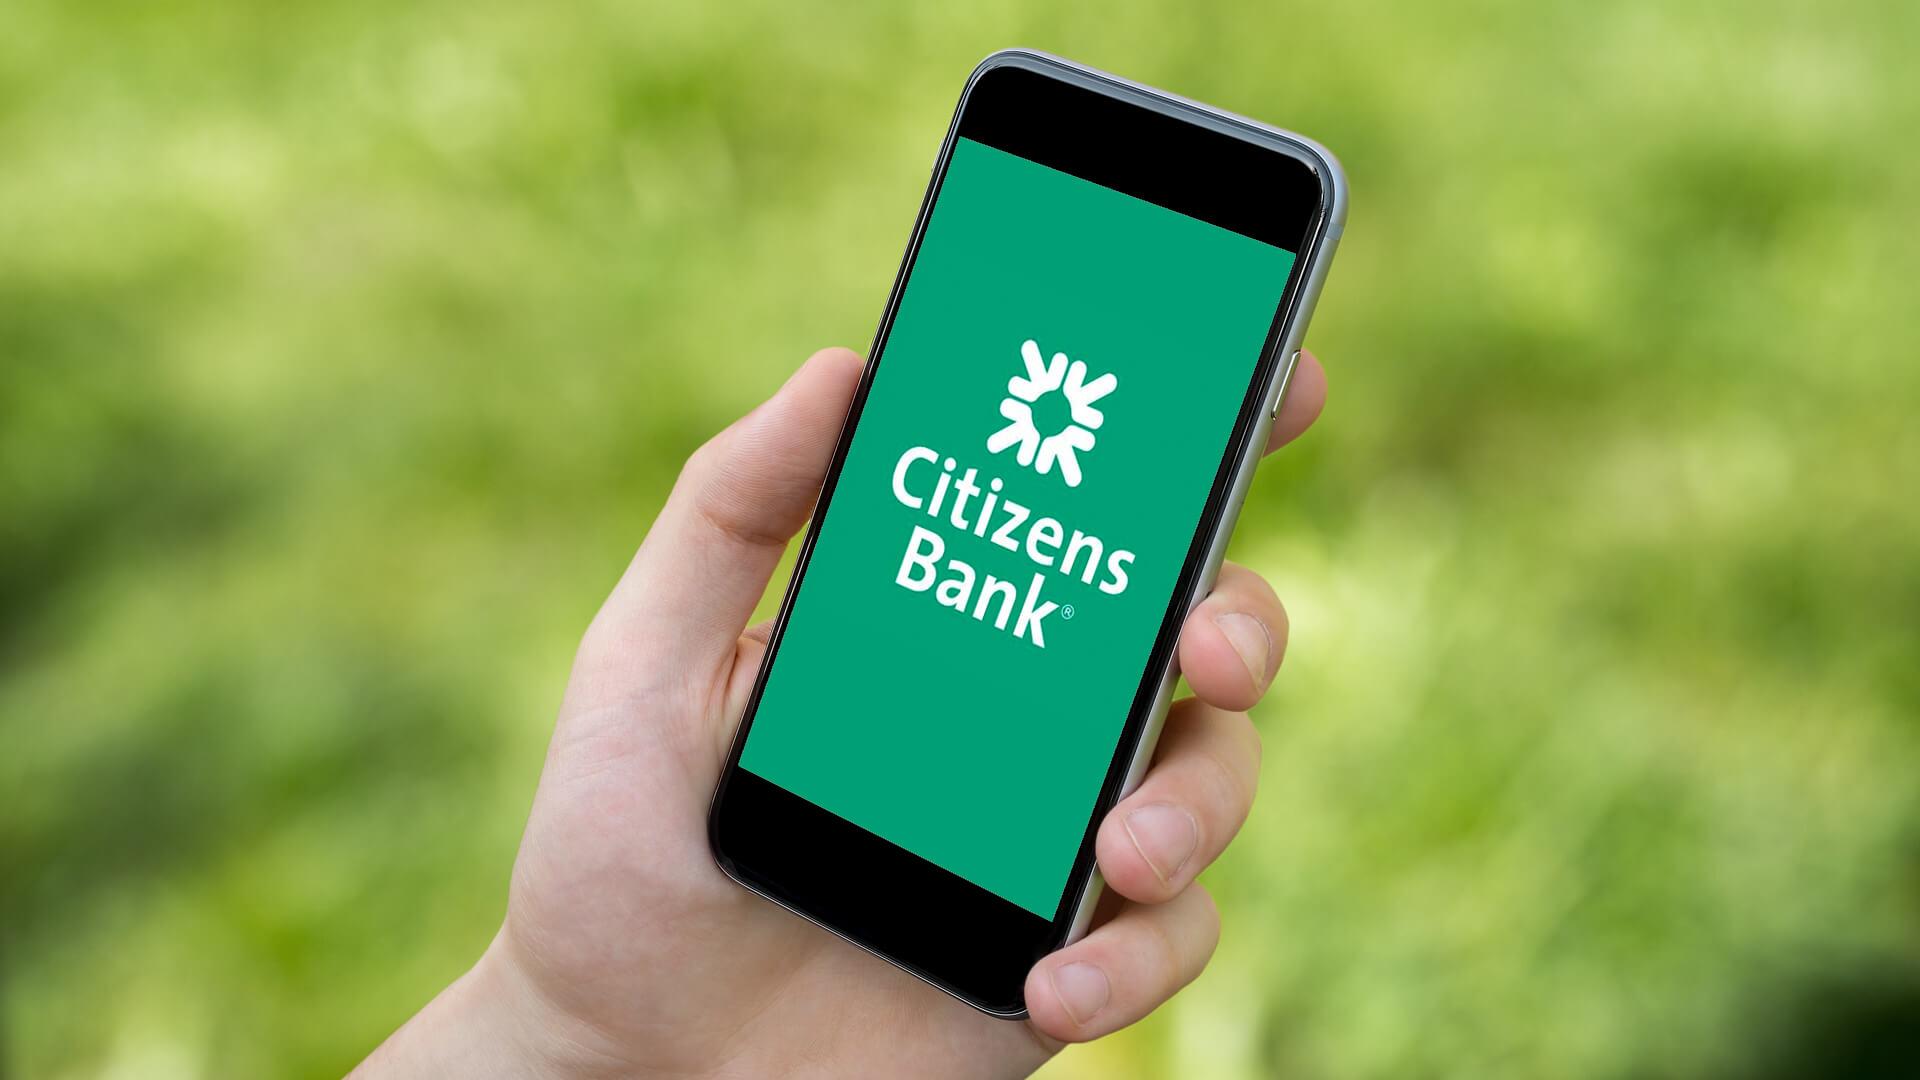 Citizens Bank mobile phone app